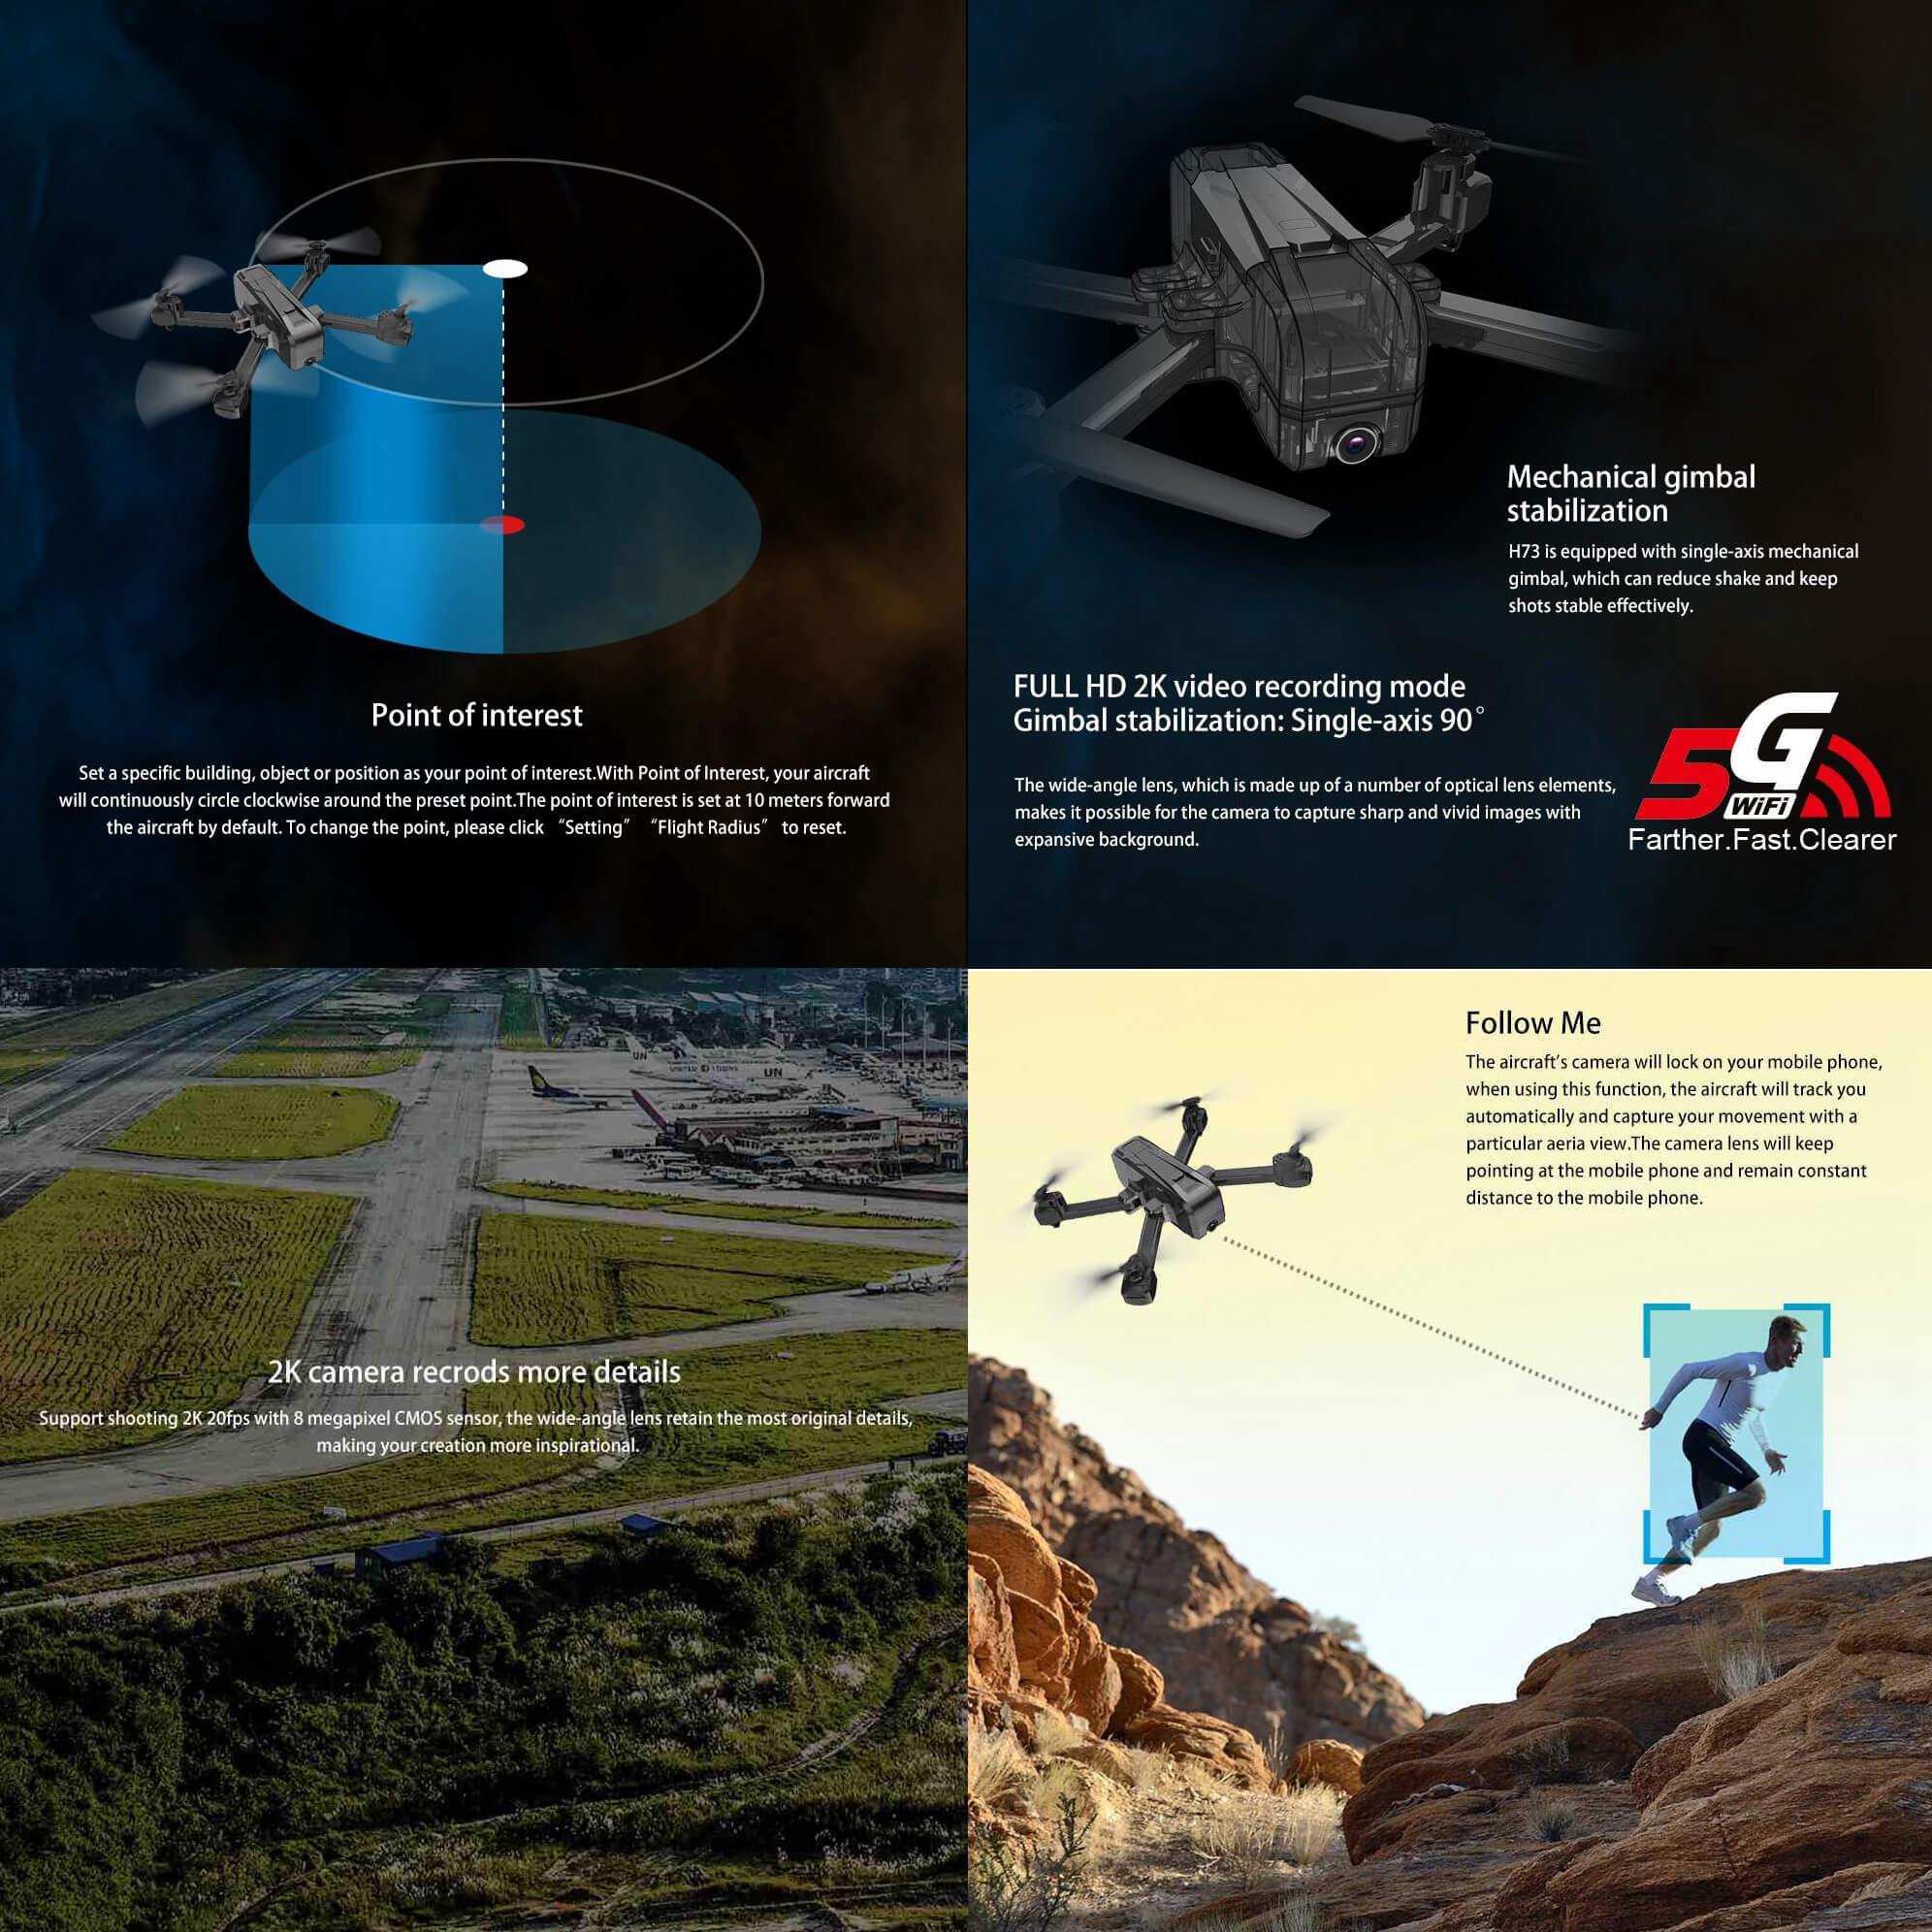 Składany dron JJRC H73 opis funkcji kamery